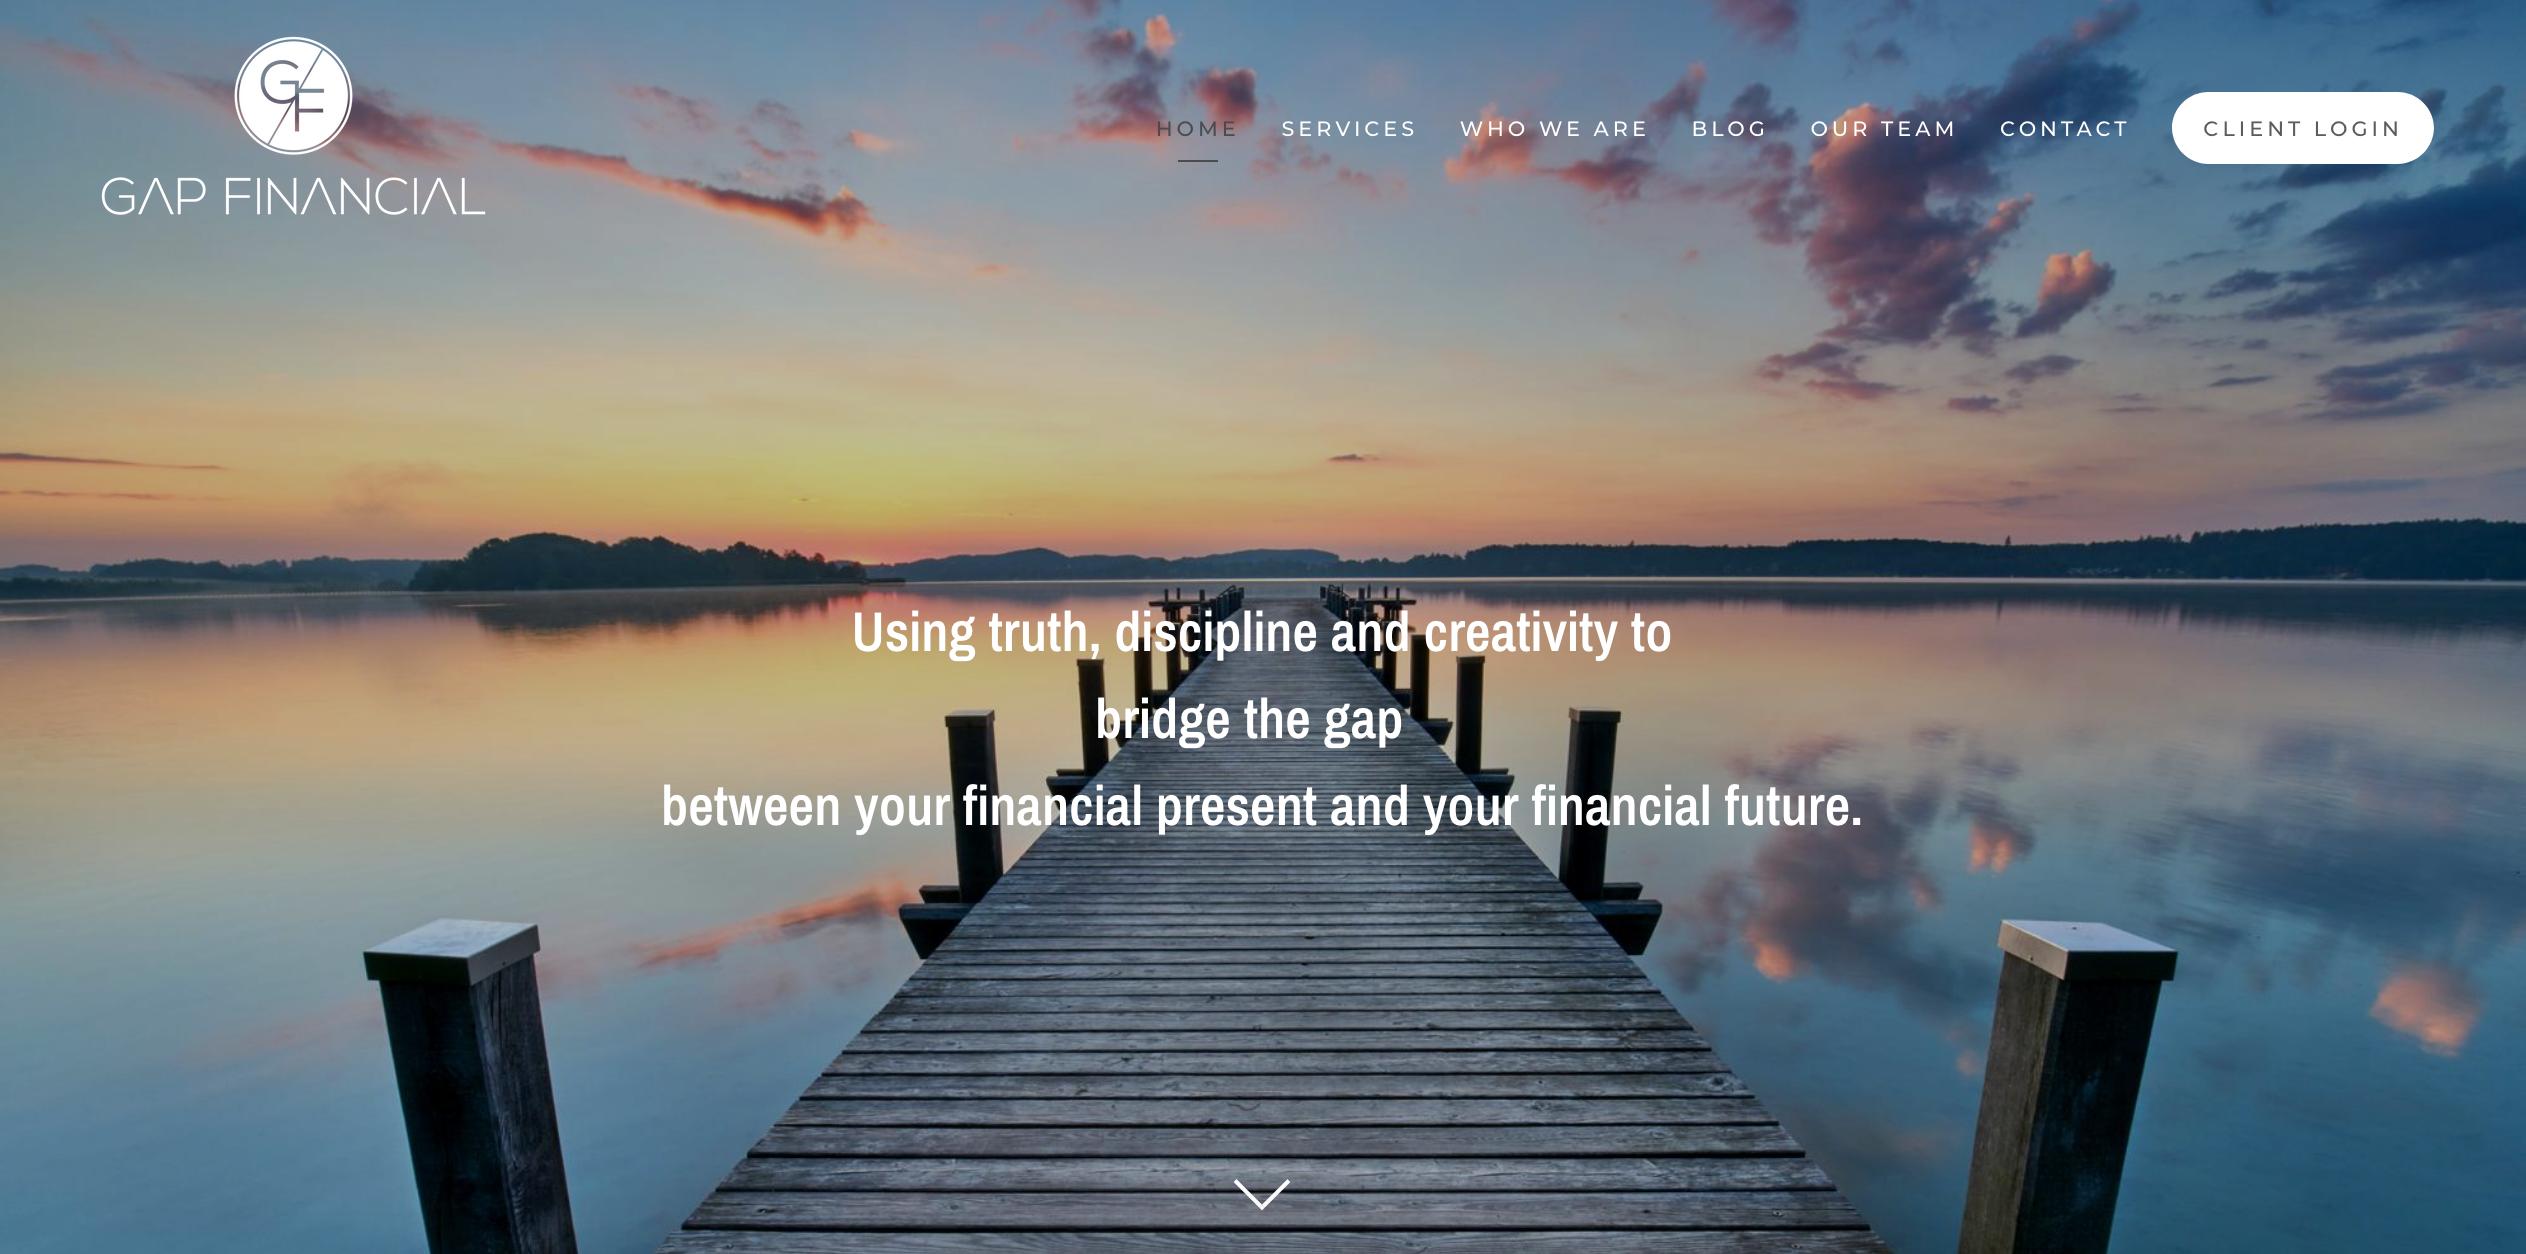 Gap Financial Services, a Twenty Over Ten website